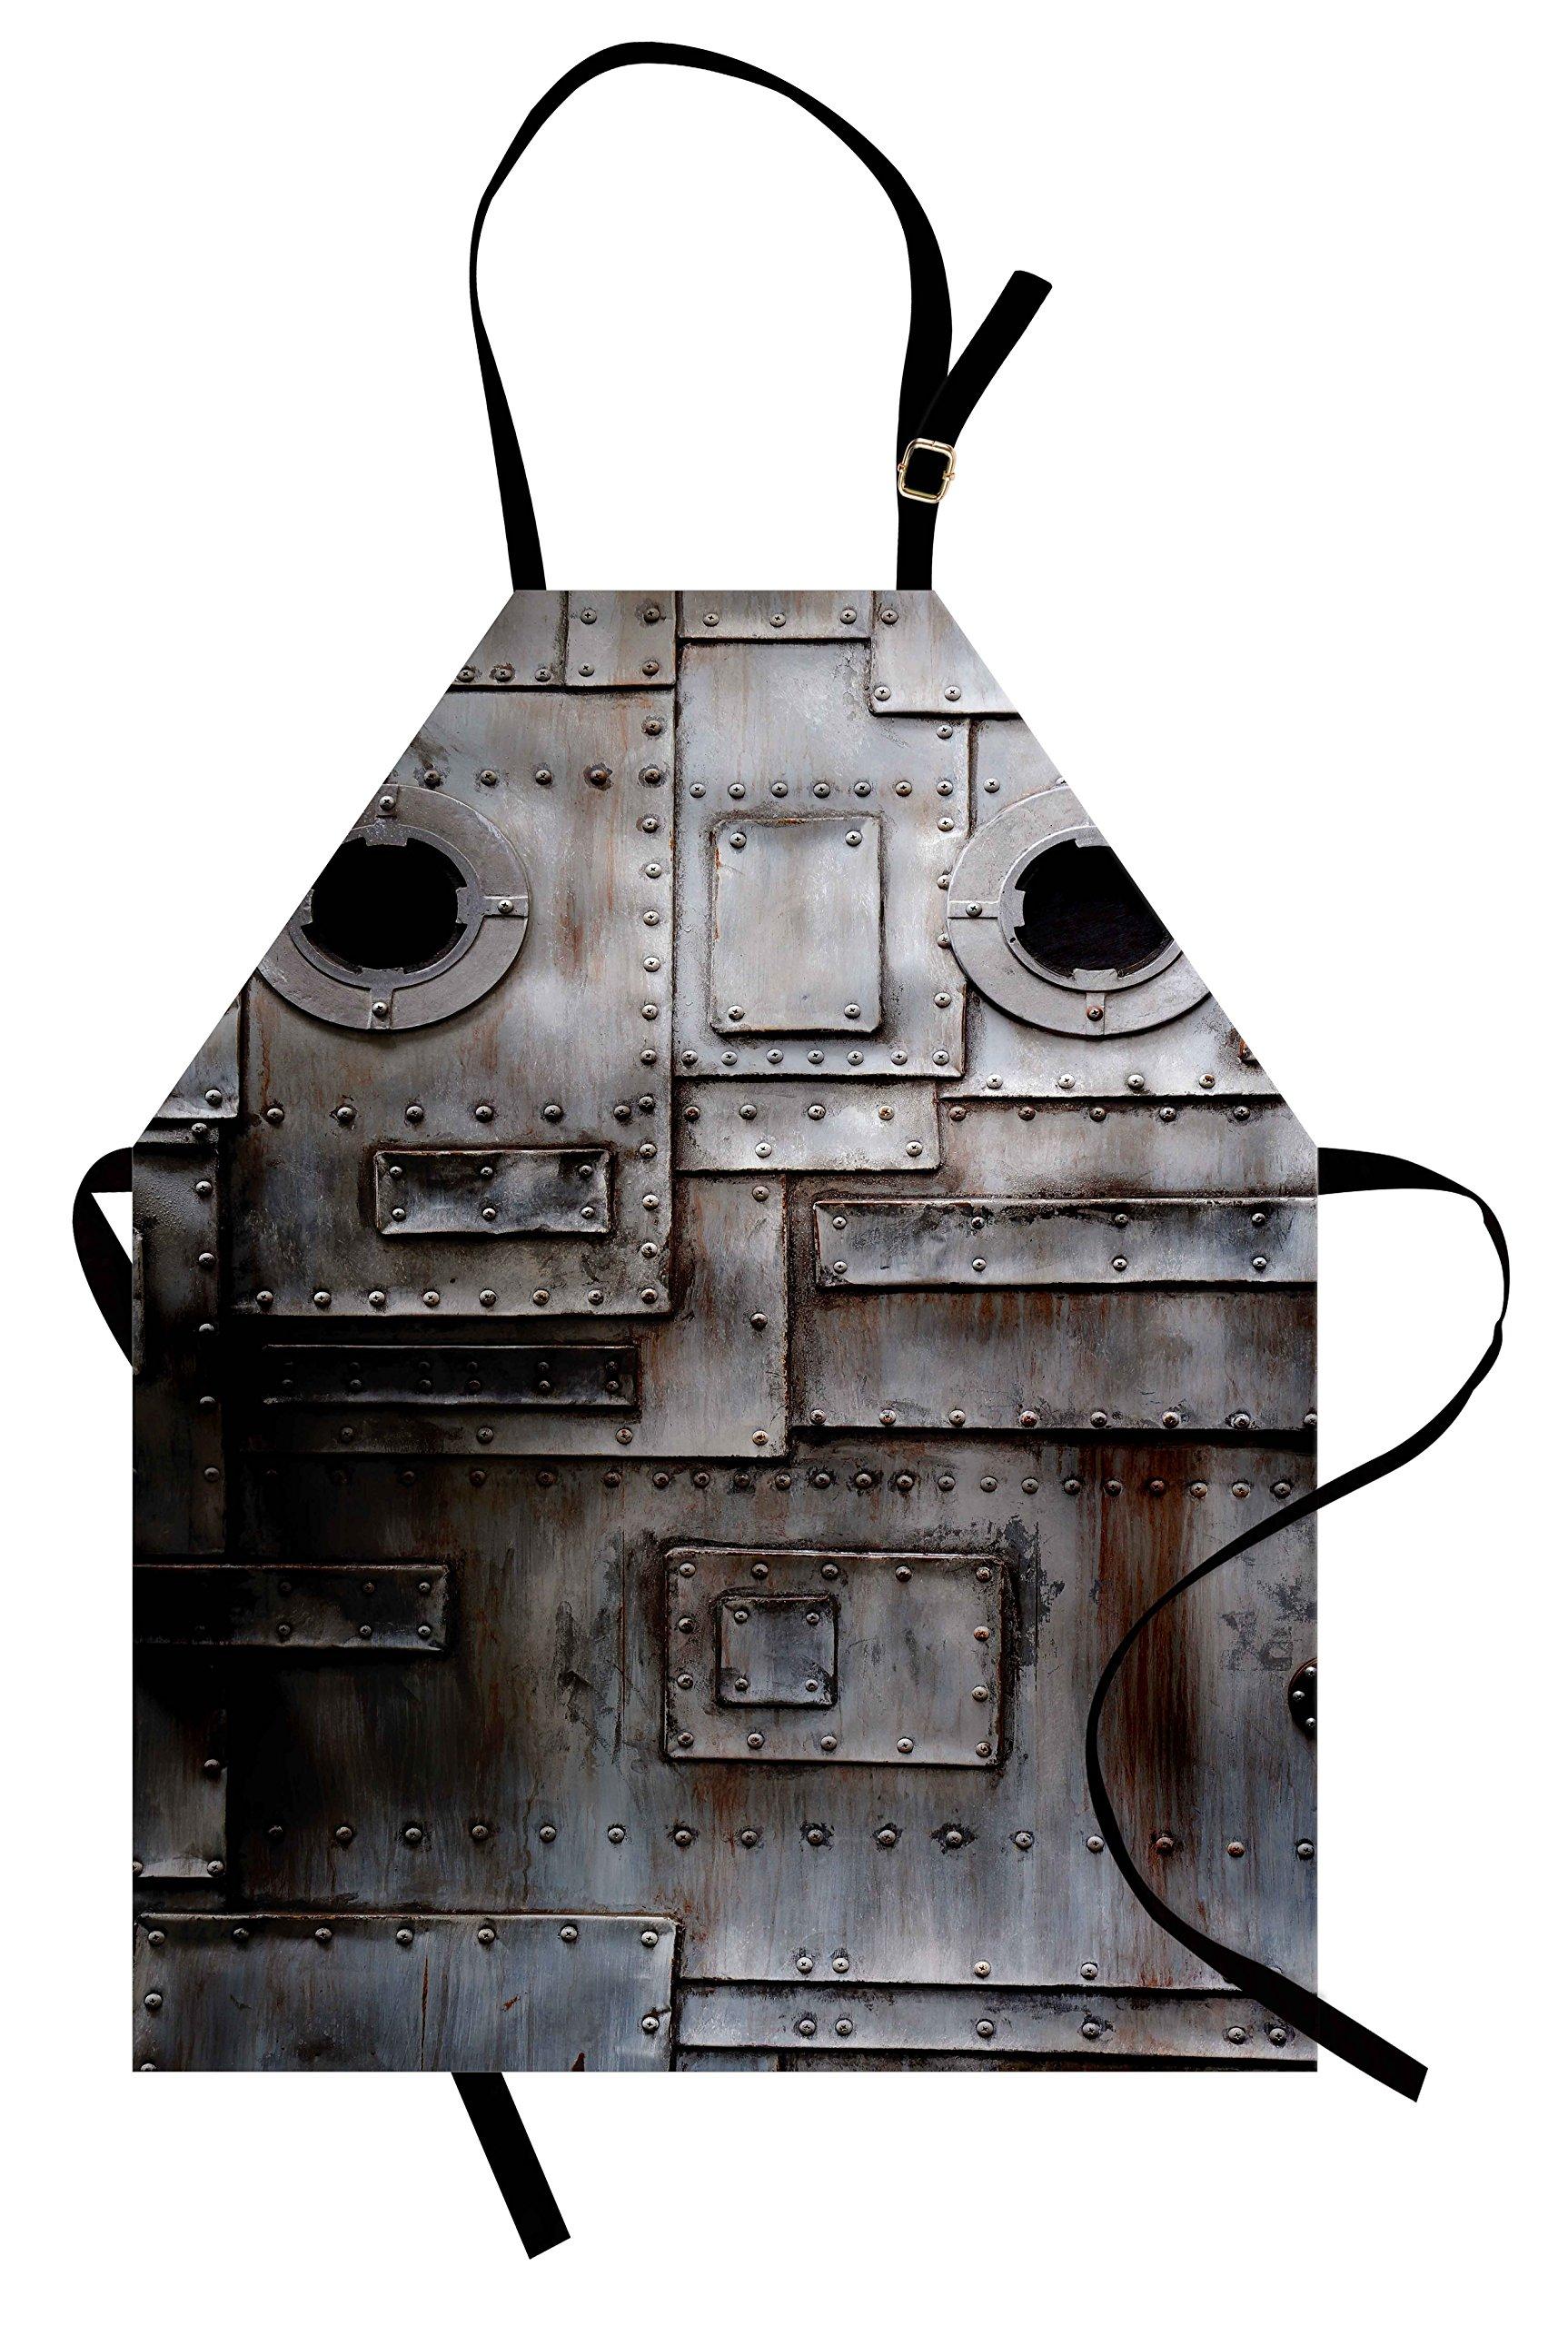 Ambesonne Industrial Apron, Rusty Stylized Iron Porthole Grunge Scratched Steel Factory Entrance Retro Image, Unisex Kitchen Bib Apron with Adjustable Neck for Cooking Baking Gardening, Dark Taupe